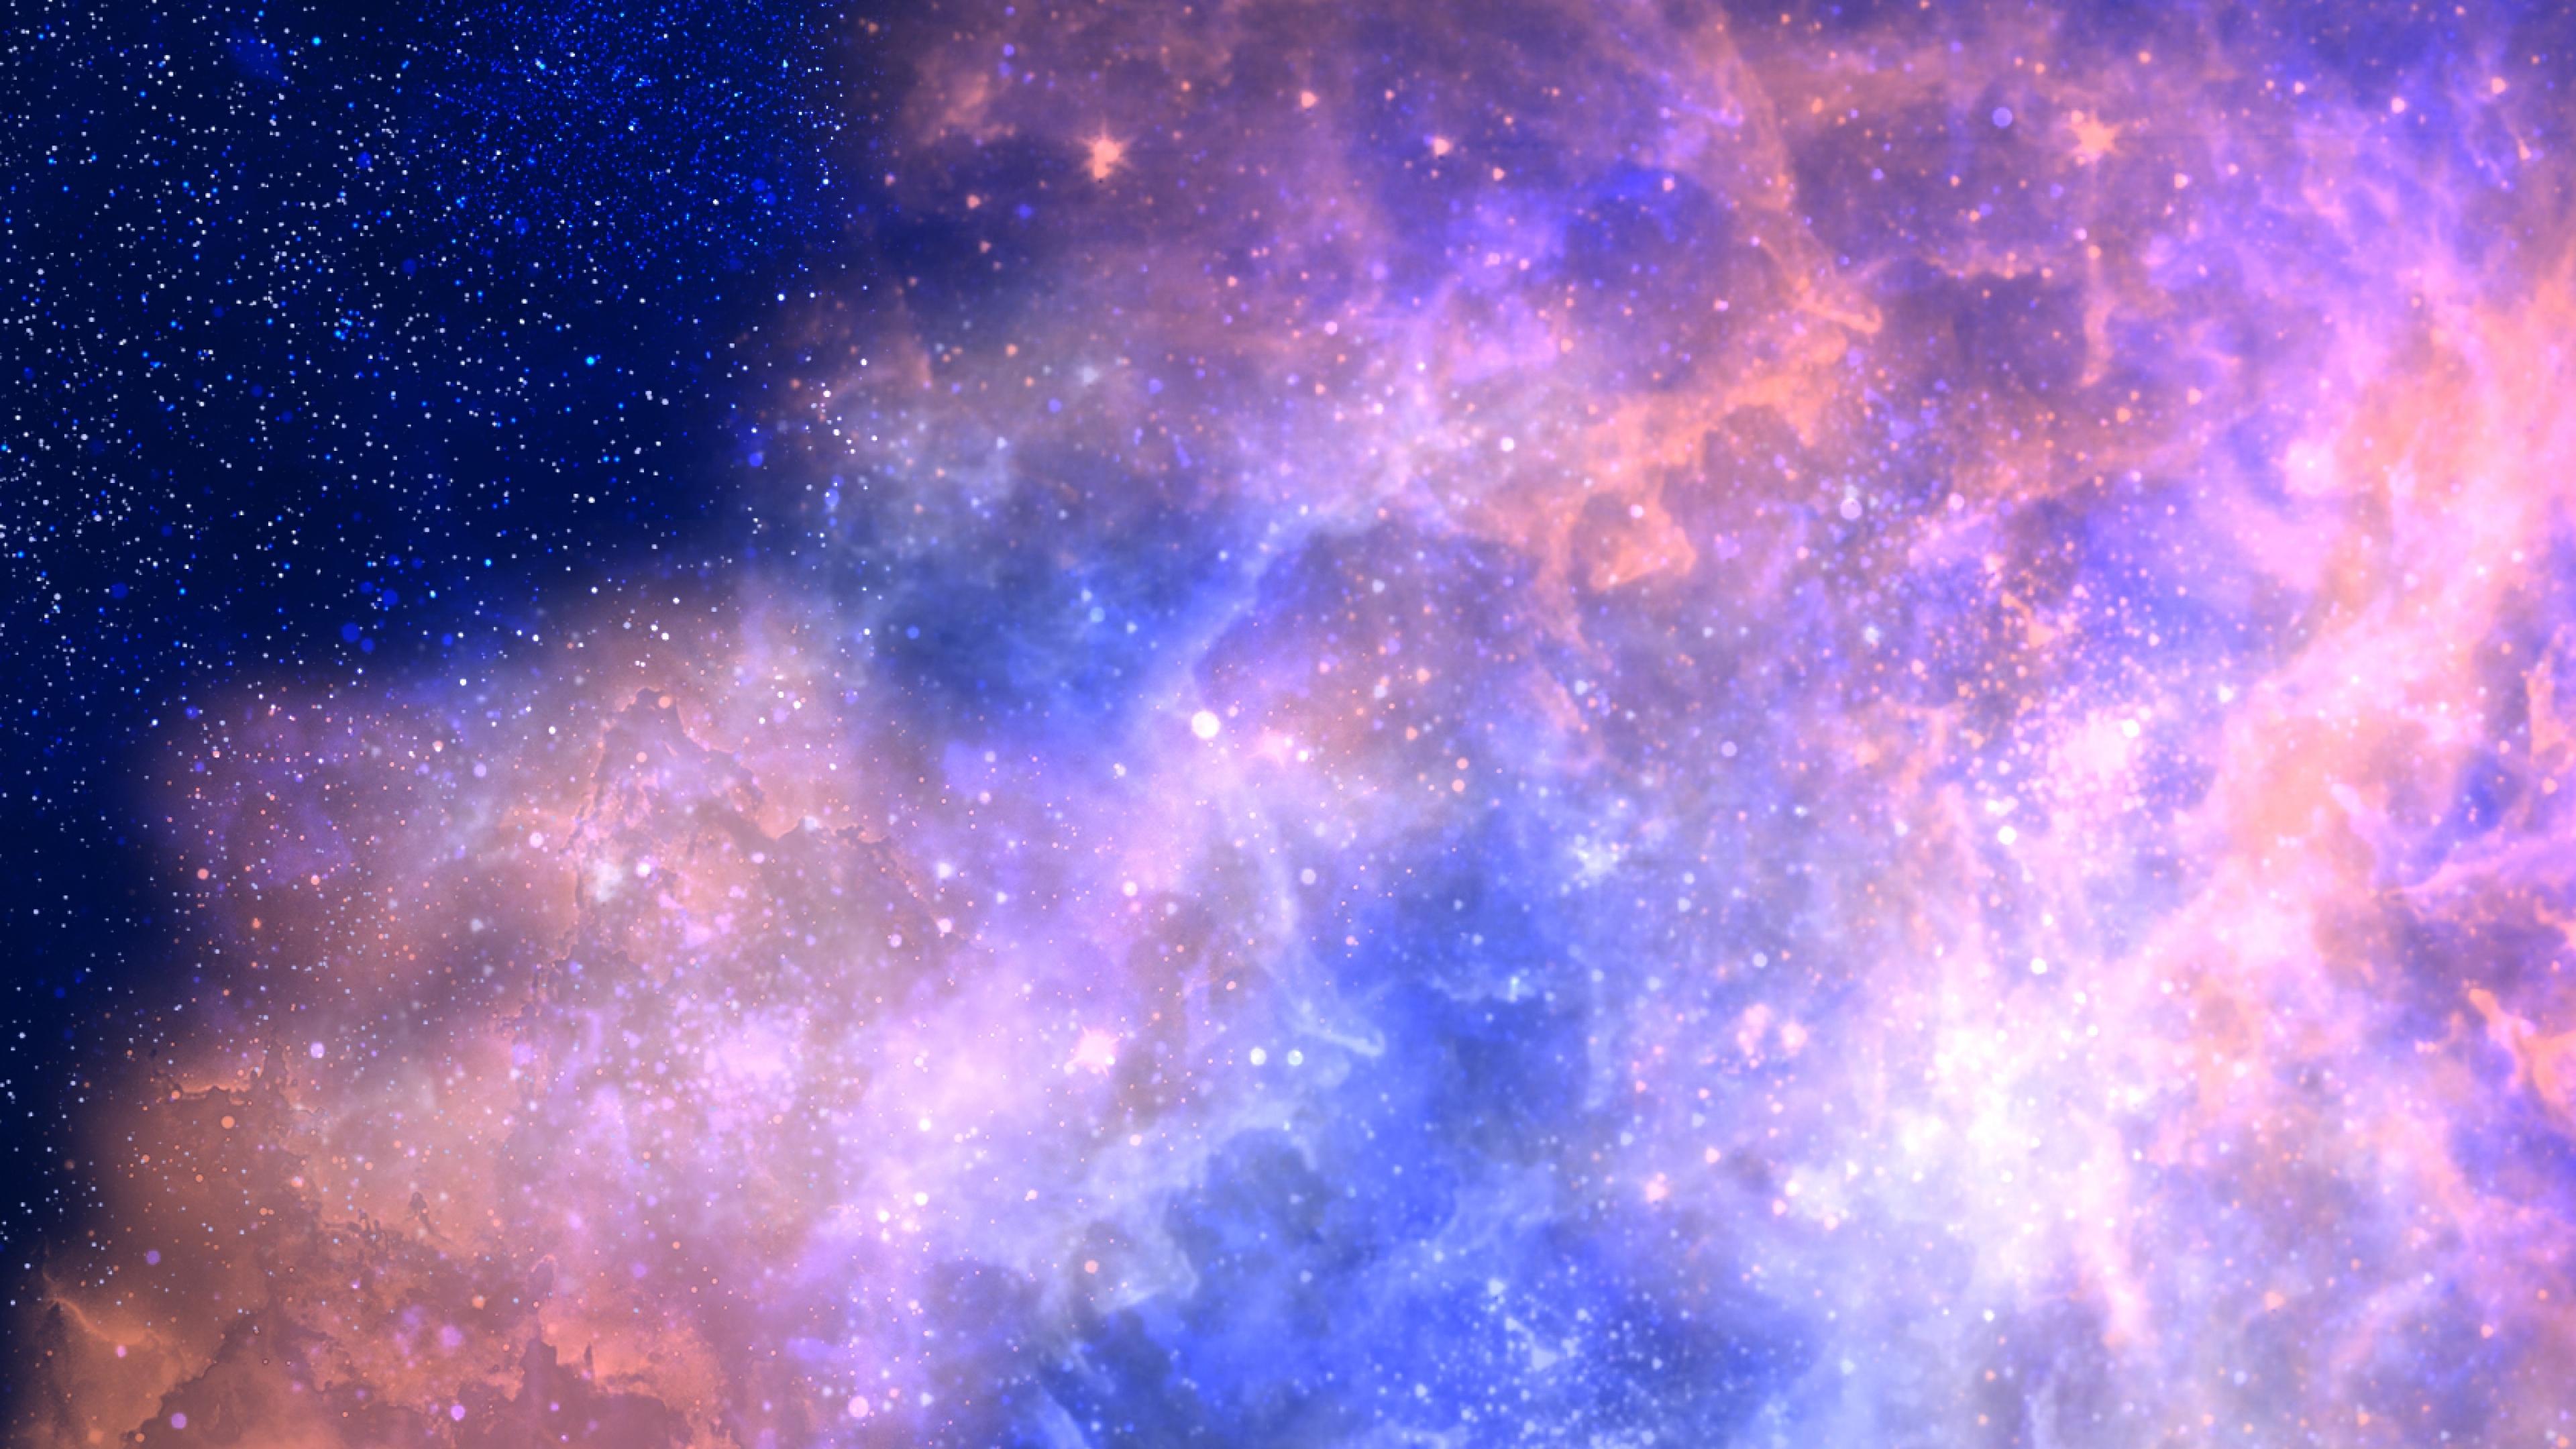 Galaxy 4k 34836 Hd Wallpaper Backgrounds Download